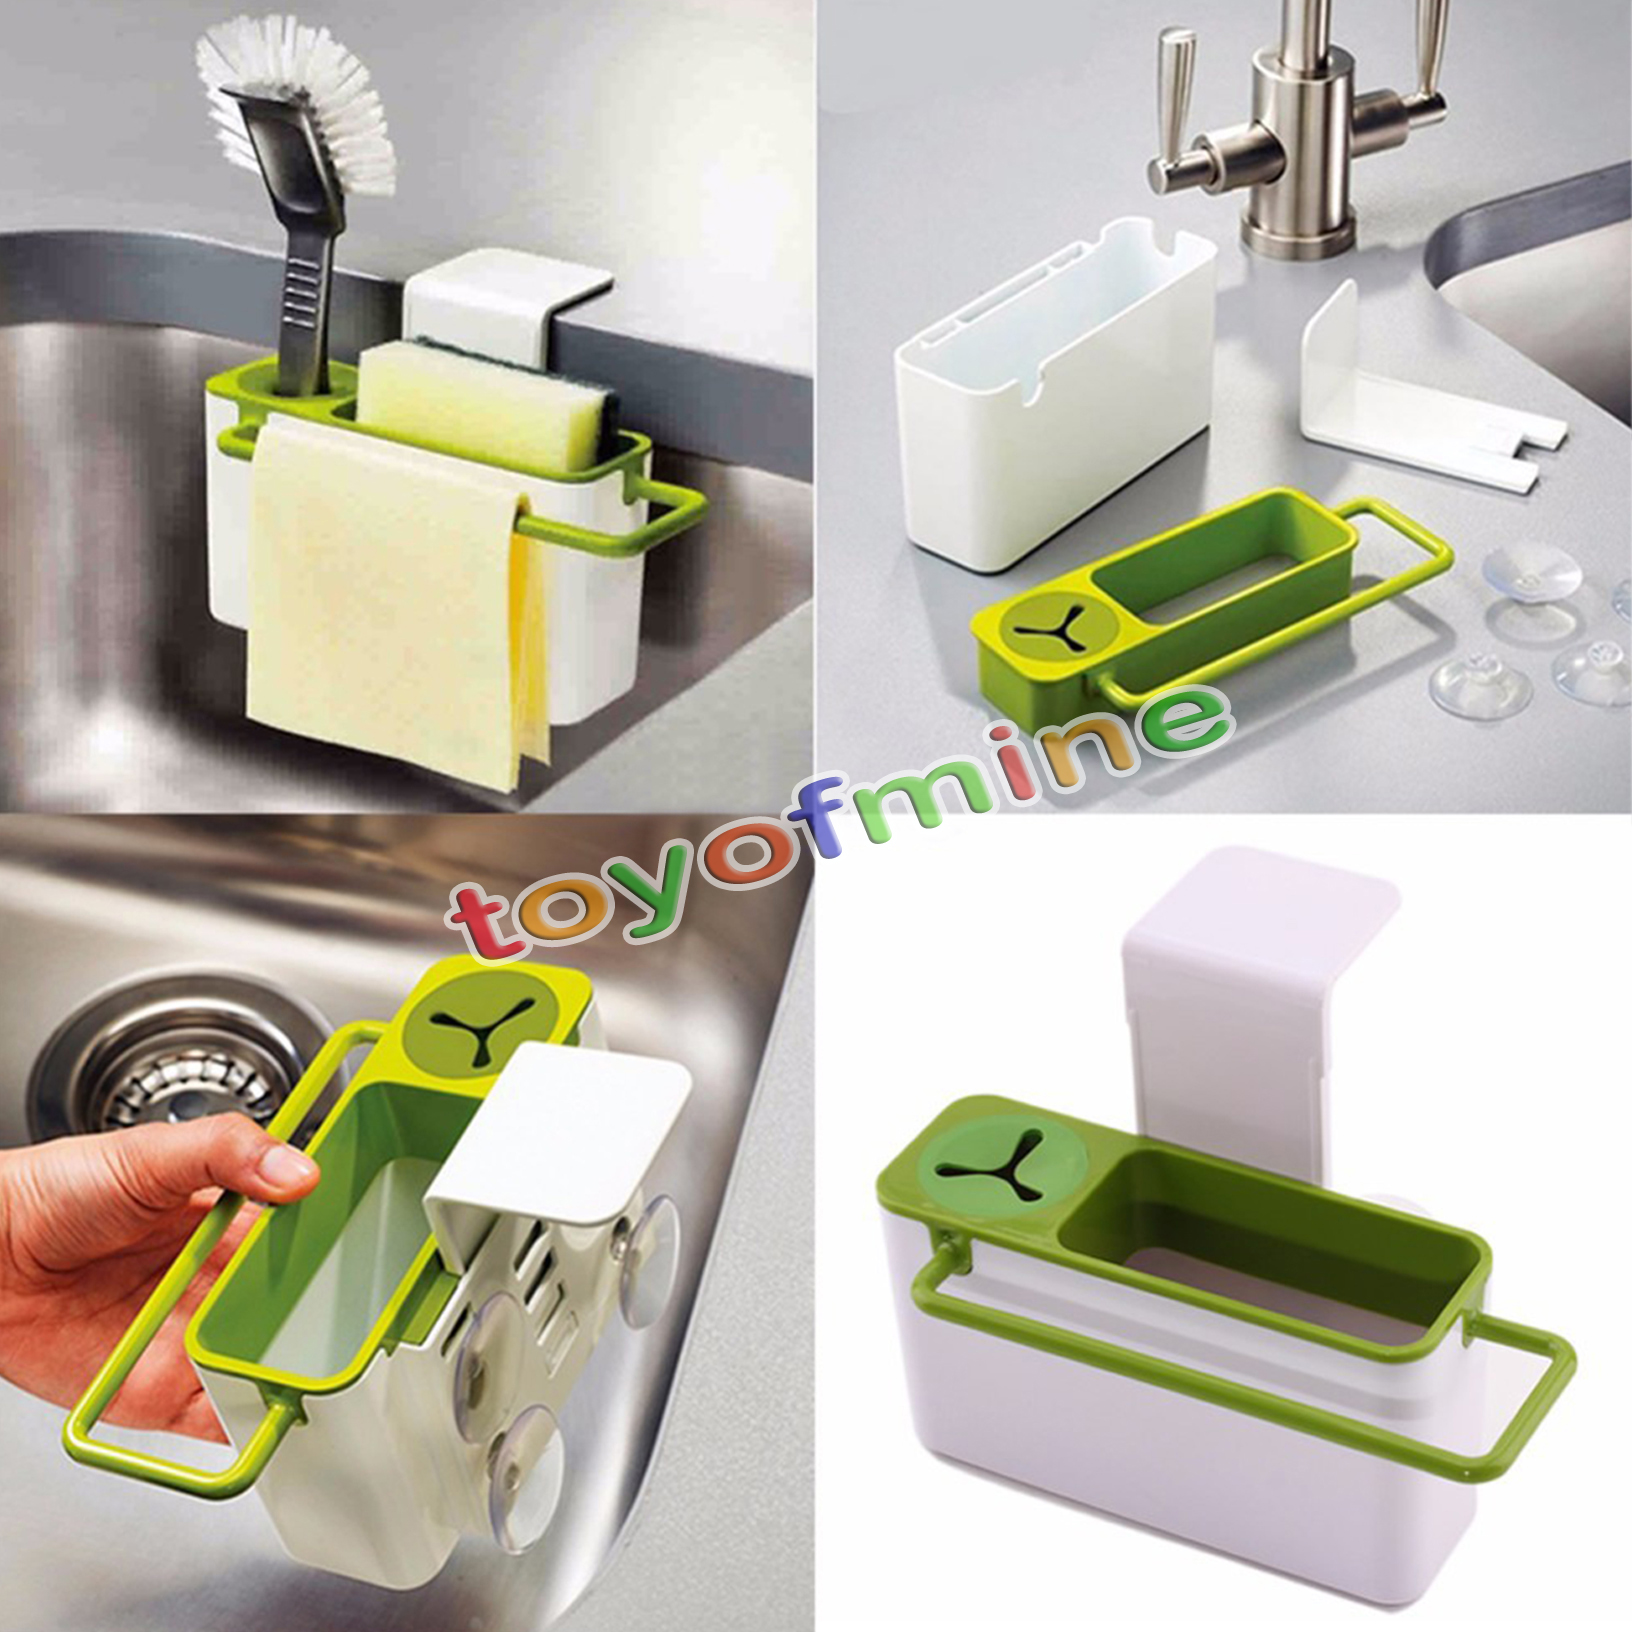 Suction Cup Base Kitchen Brush Sponge Sink Draining Towel Rack Washing Holder Mini Bathroom Shelves Soap Holder baby toys